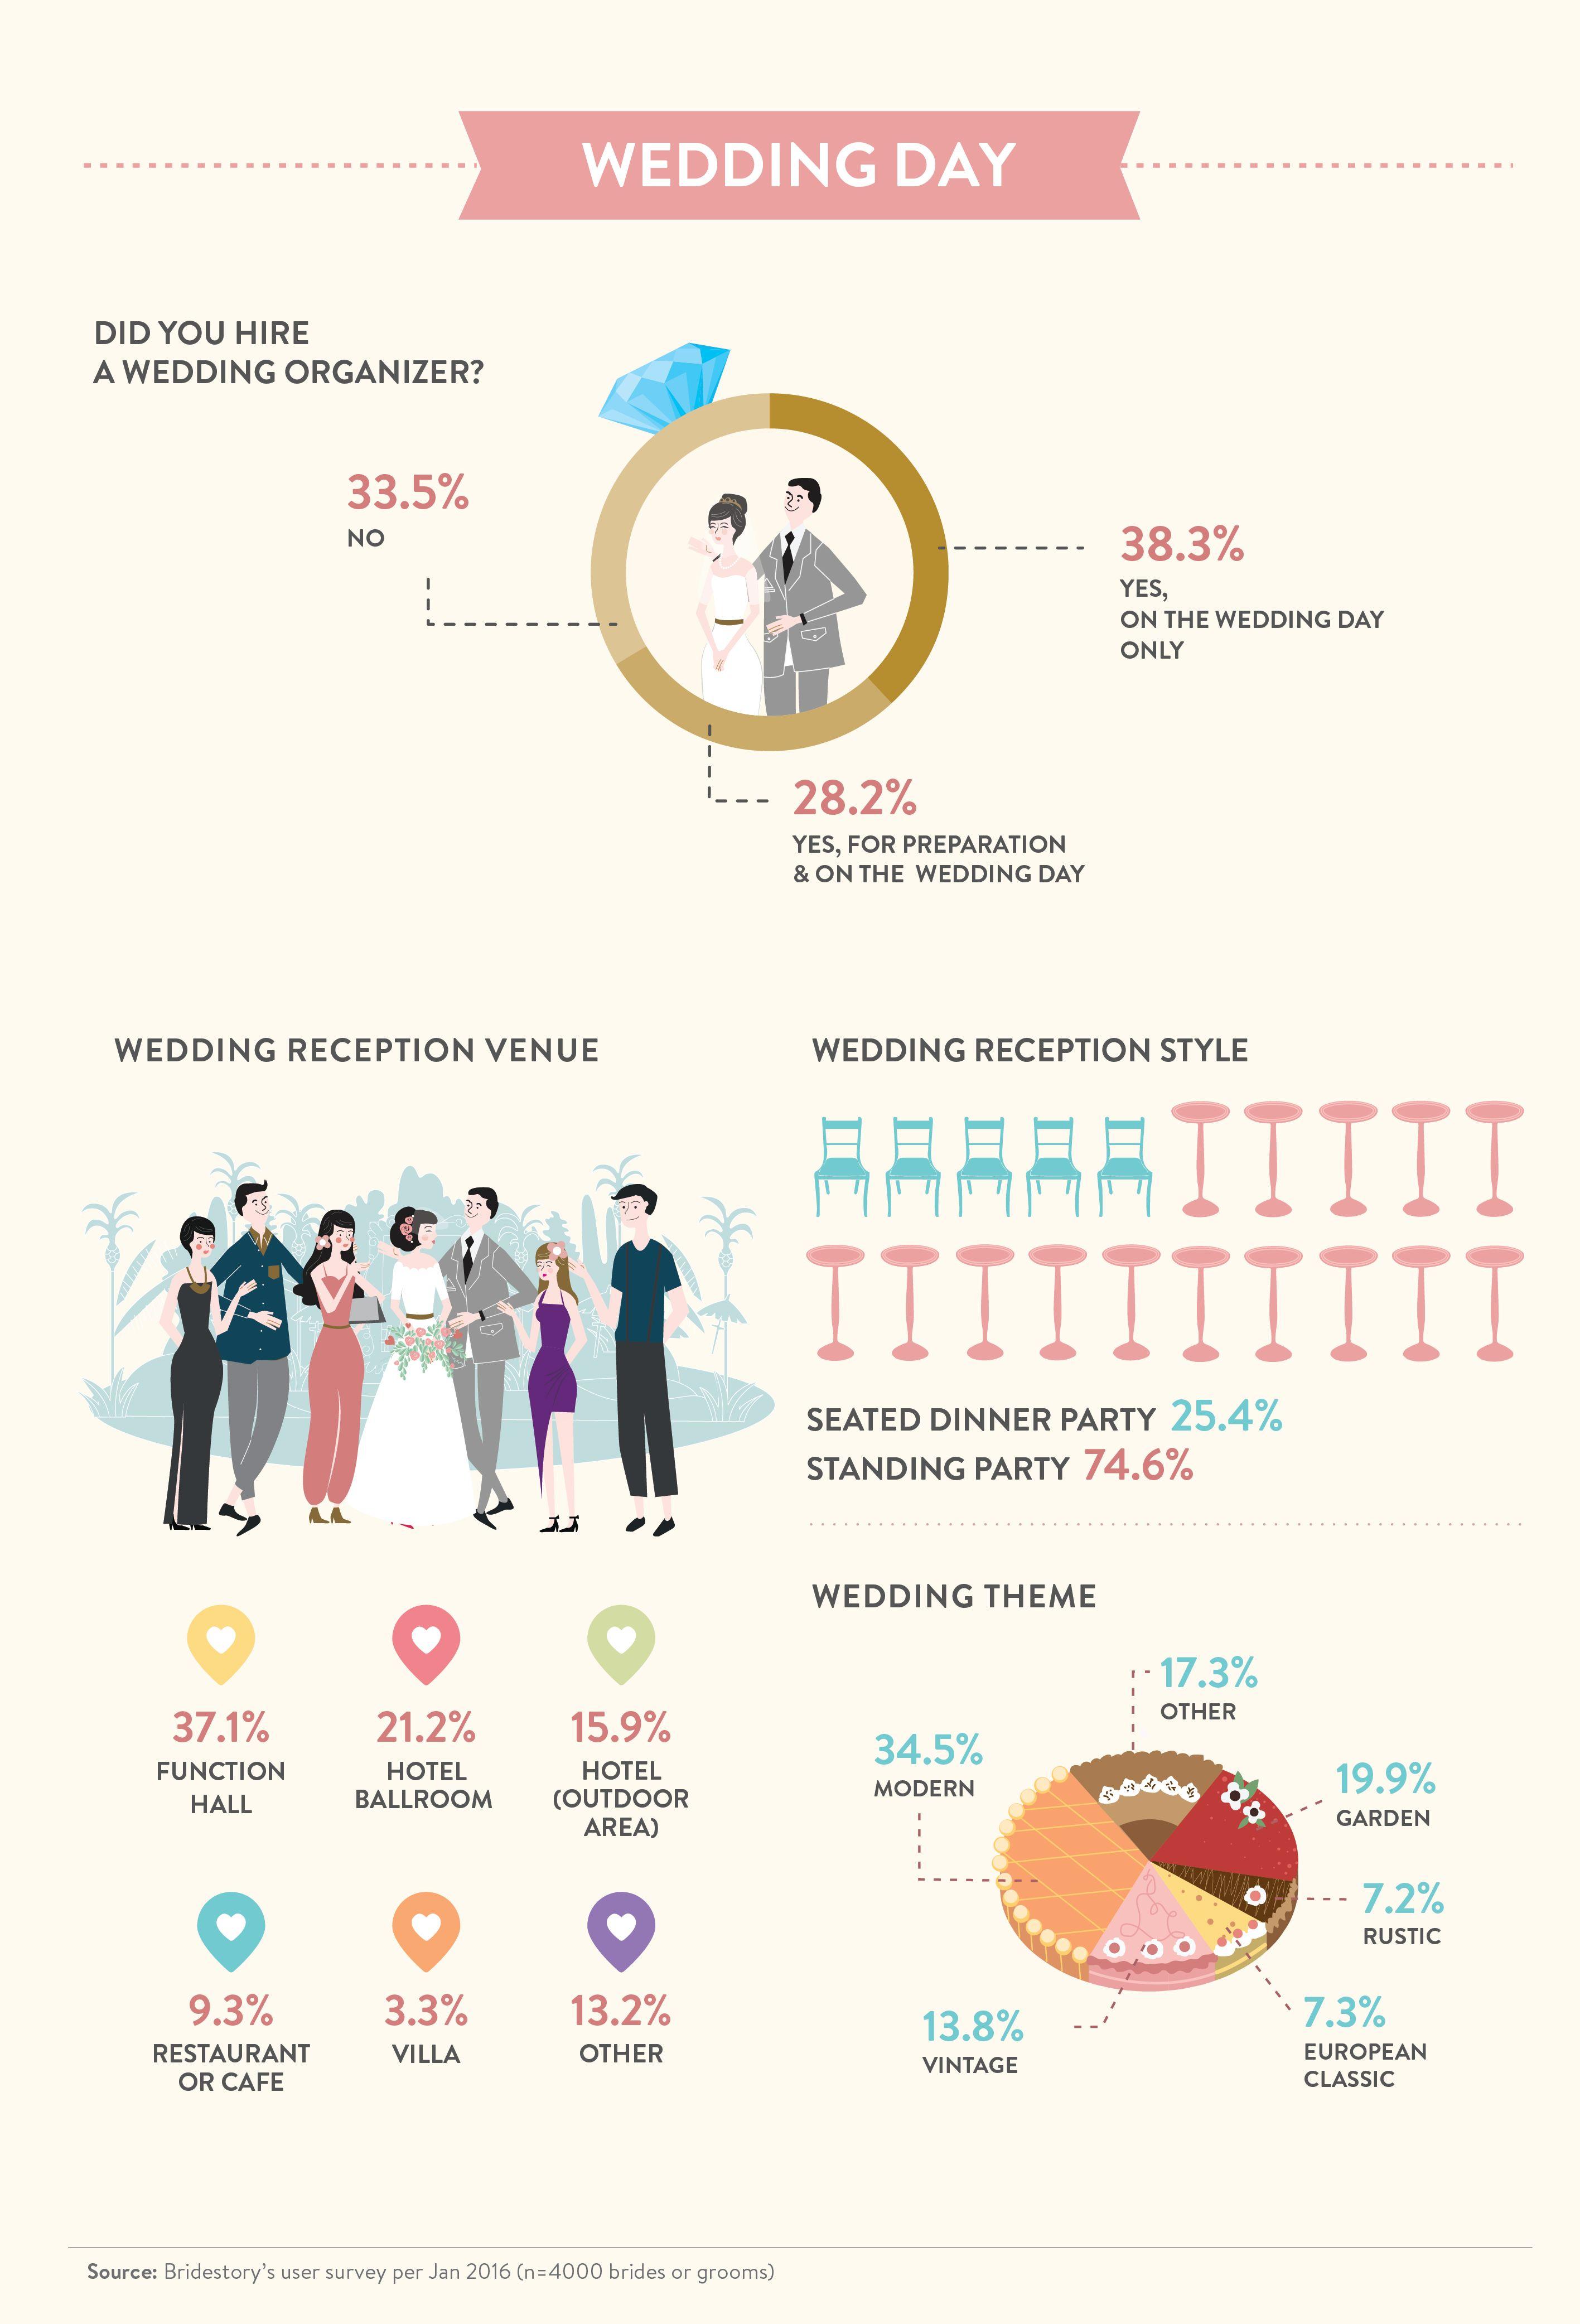 Indonesian Wedding Trend Report by Bridestory - Bridestory Blog